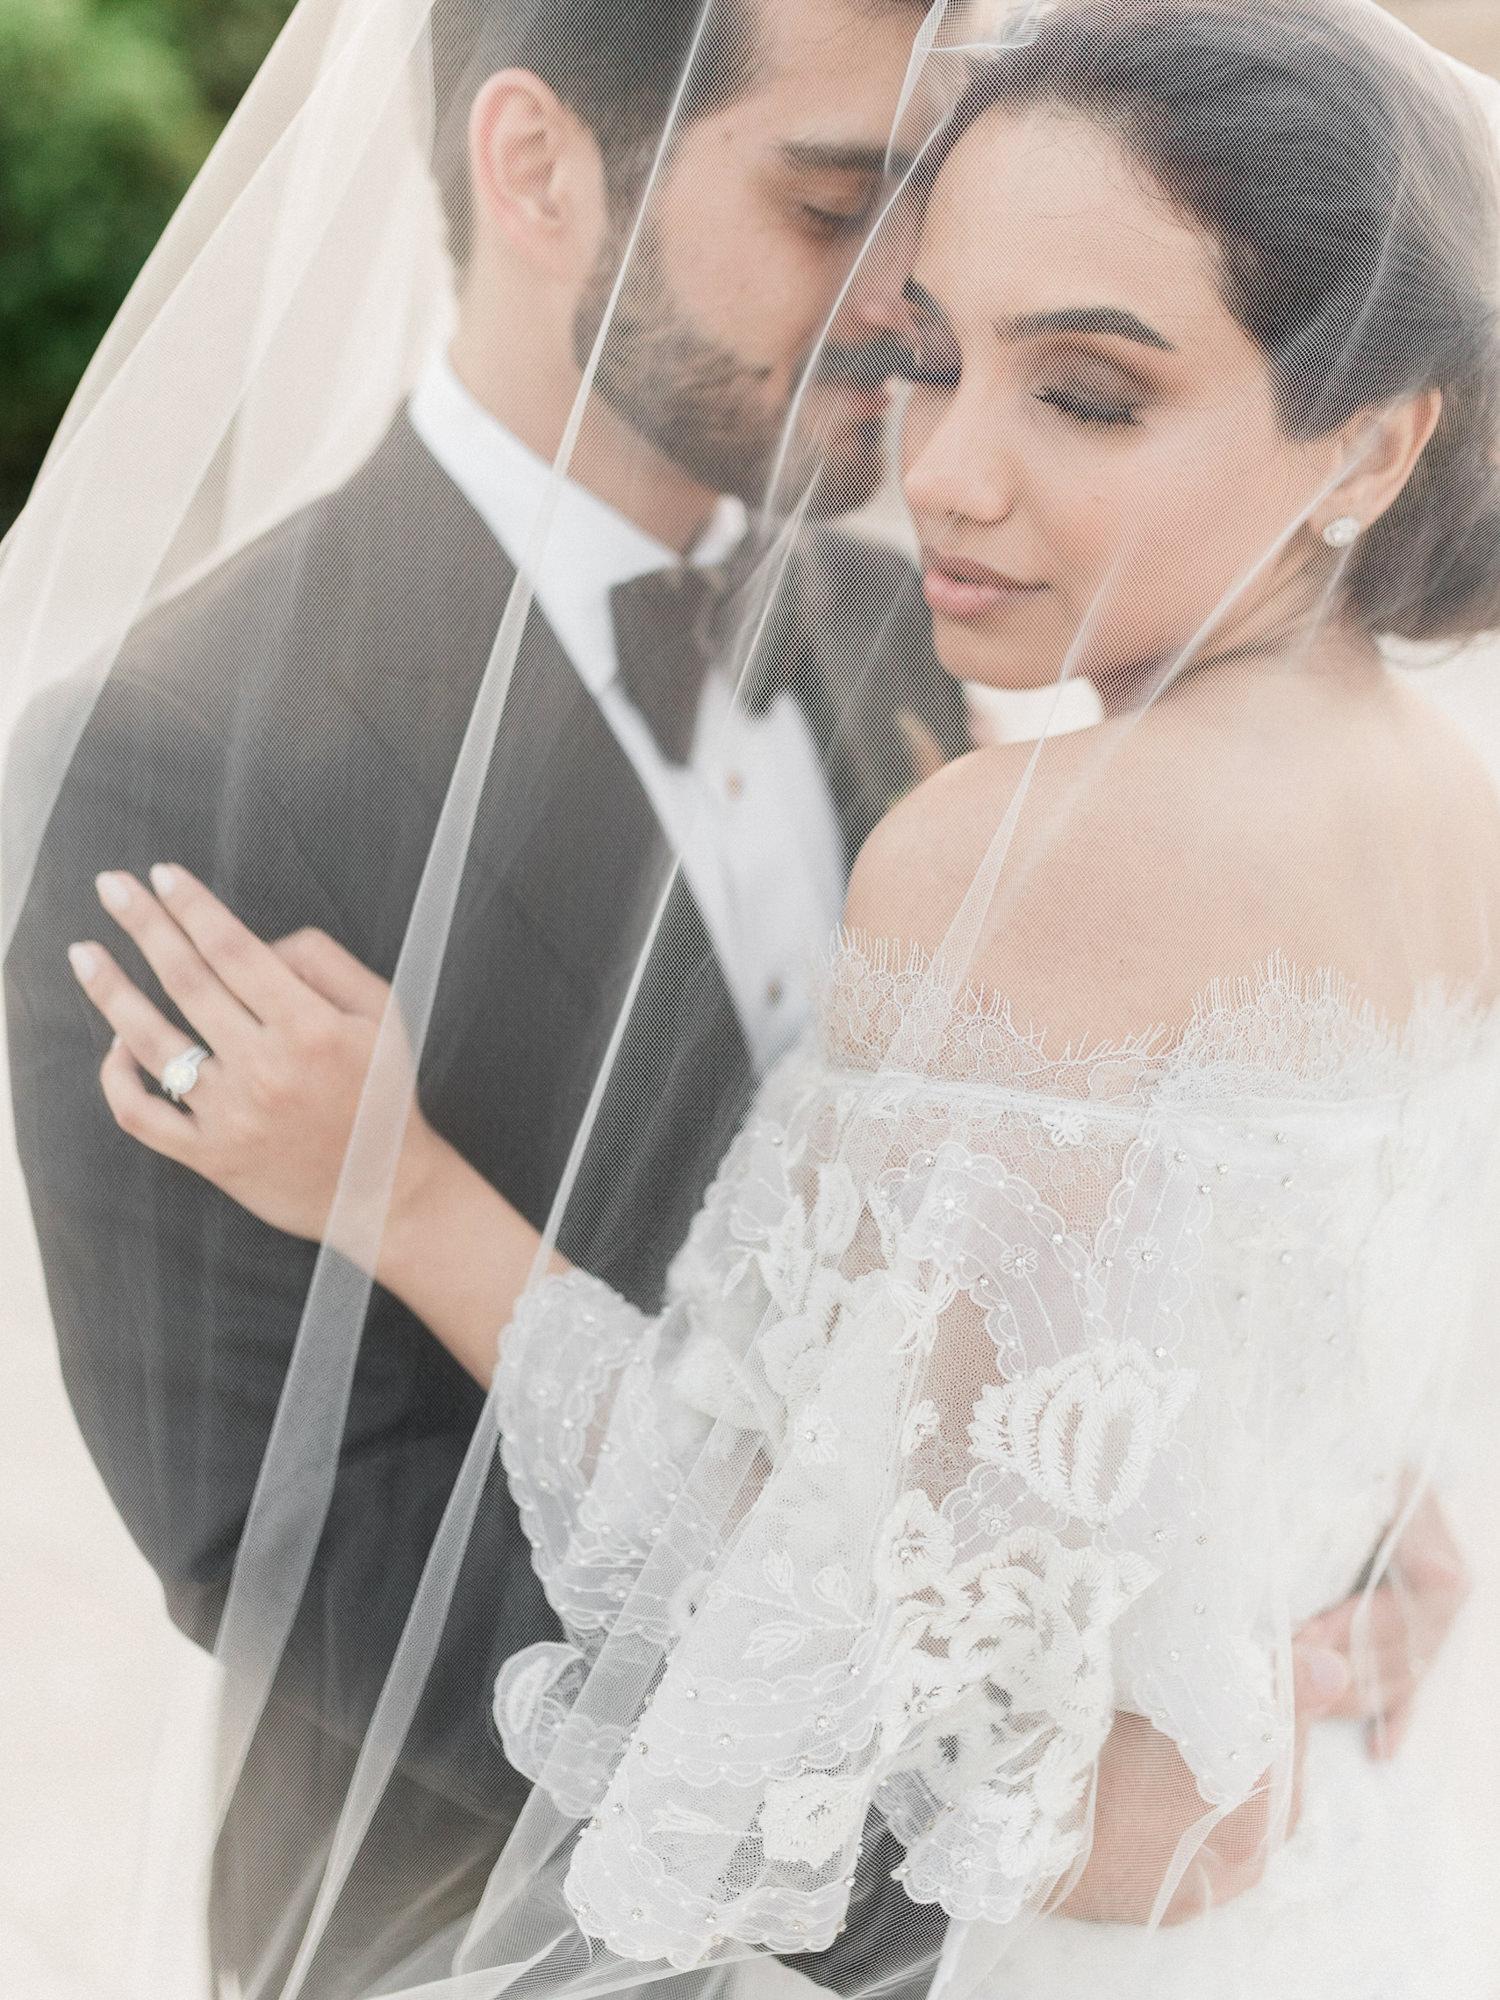 Romantic portrait of couple under veil  -  Gianluca Adovasio Photography